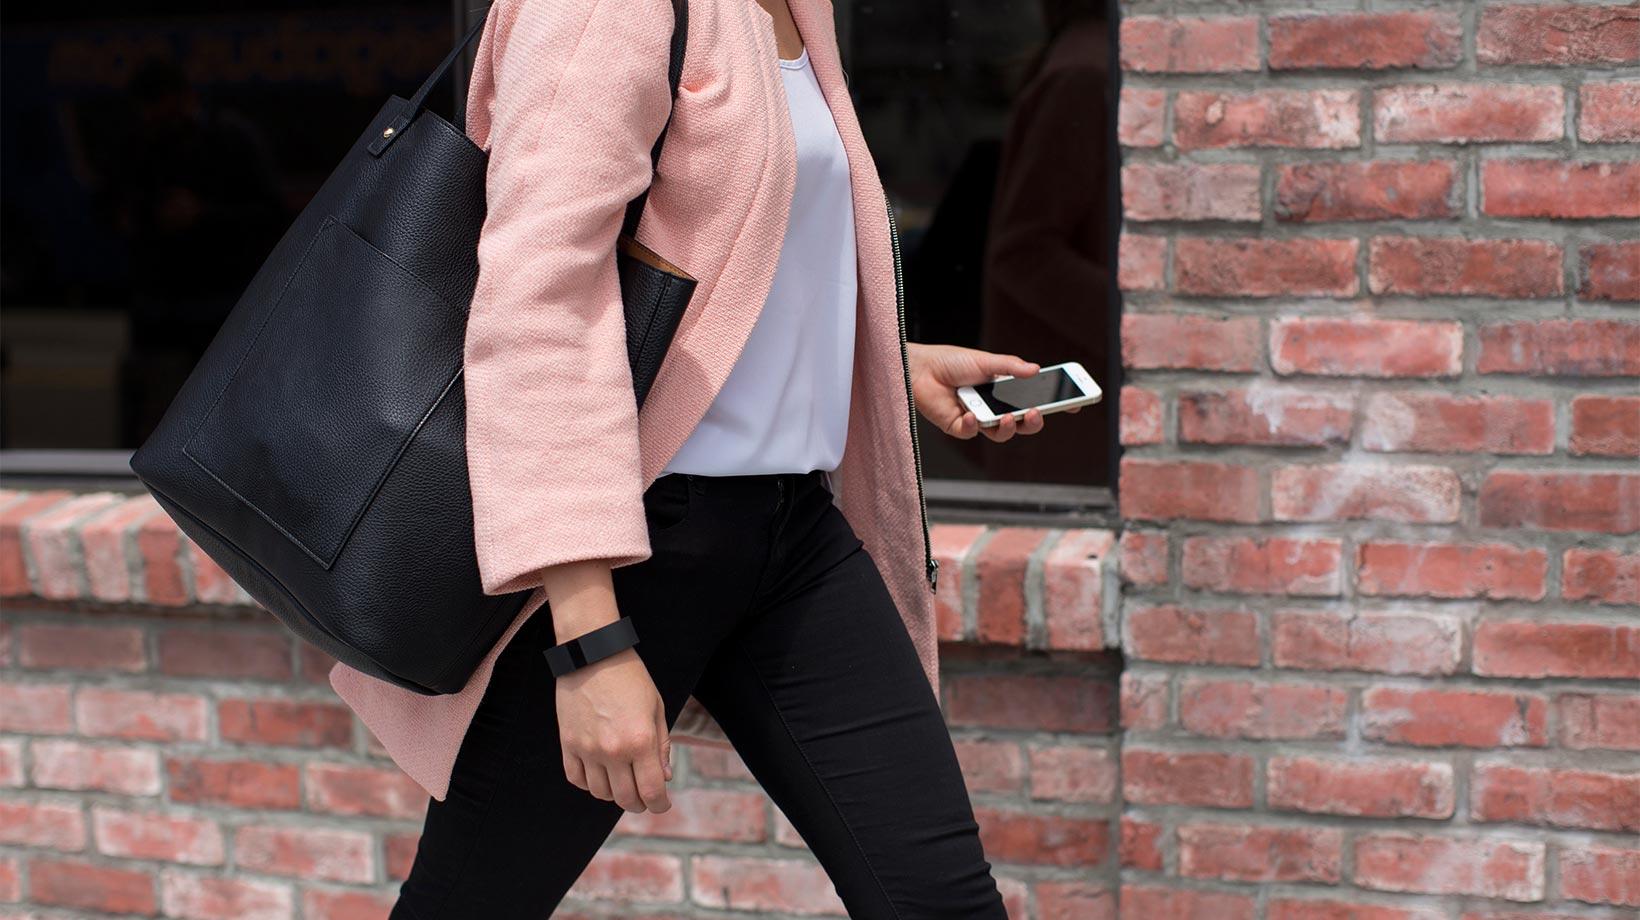 Fitbit Aktivitätstracker Charge Hr App : Welches sind die besten aktivitätstracker fitnezapp